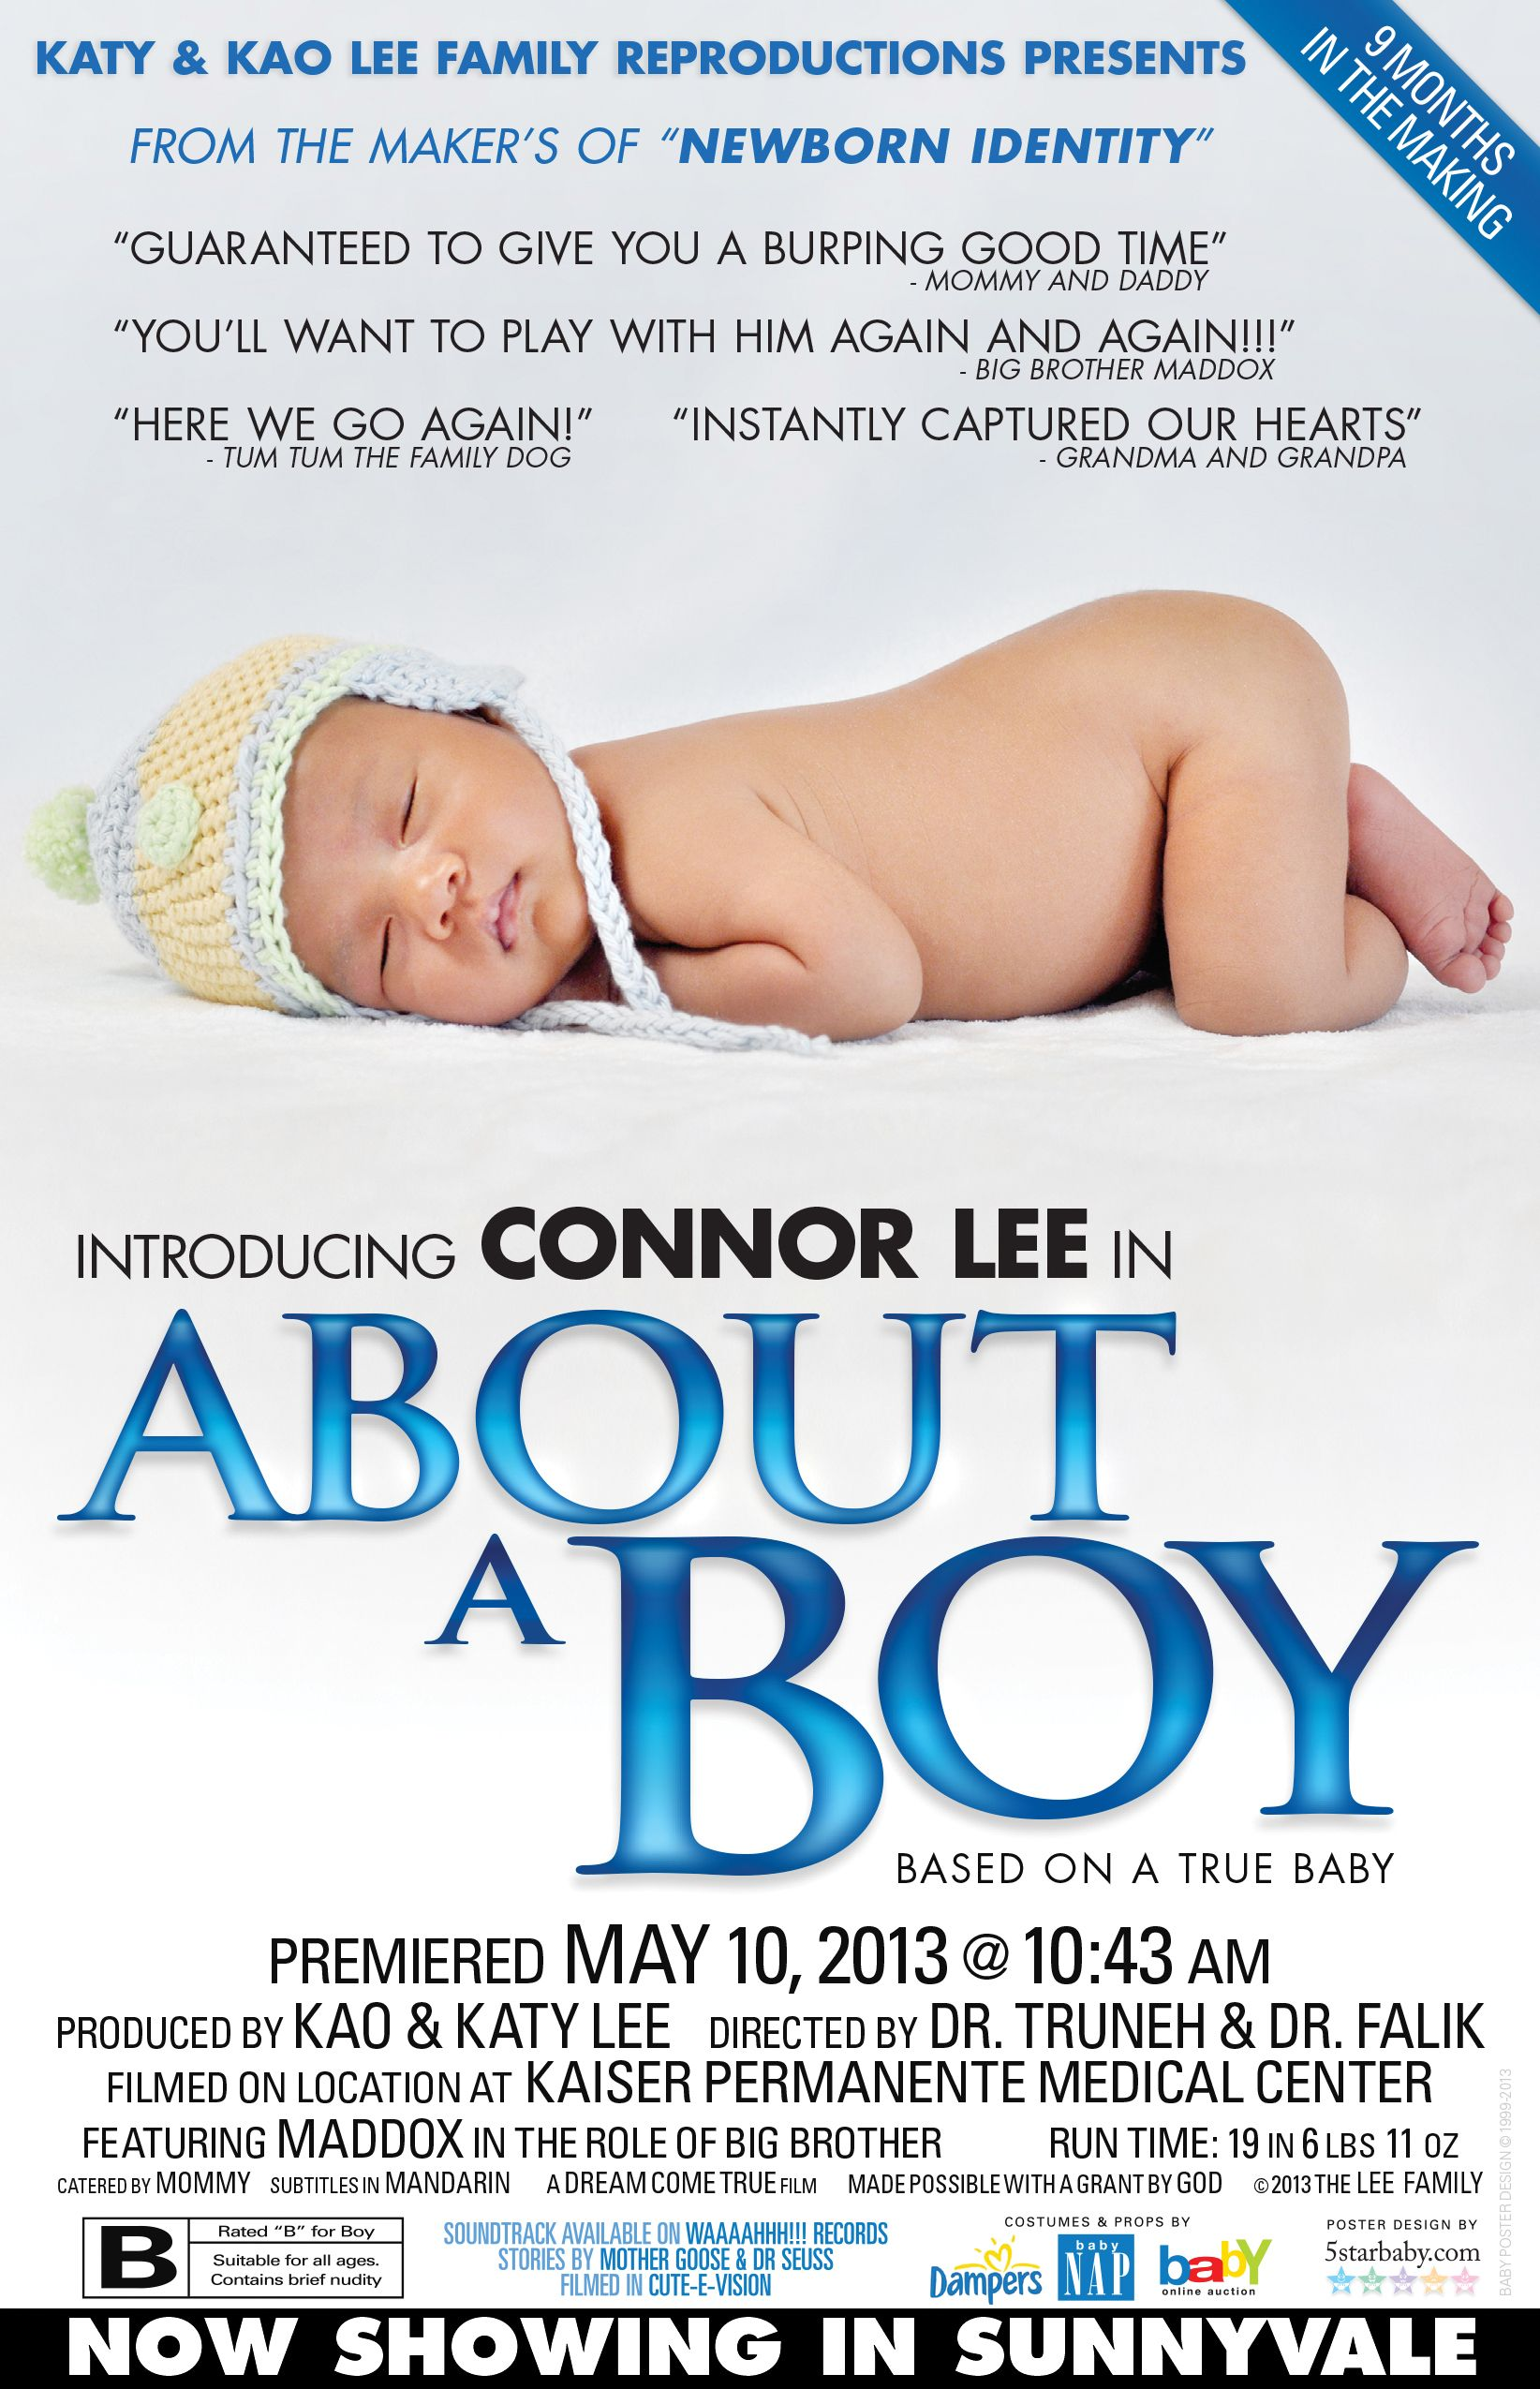 custom movie poster baby announcement www5starbabycom baby newborn birth_announcements announcements boy